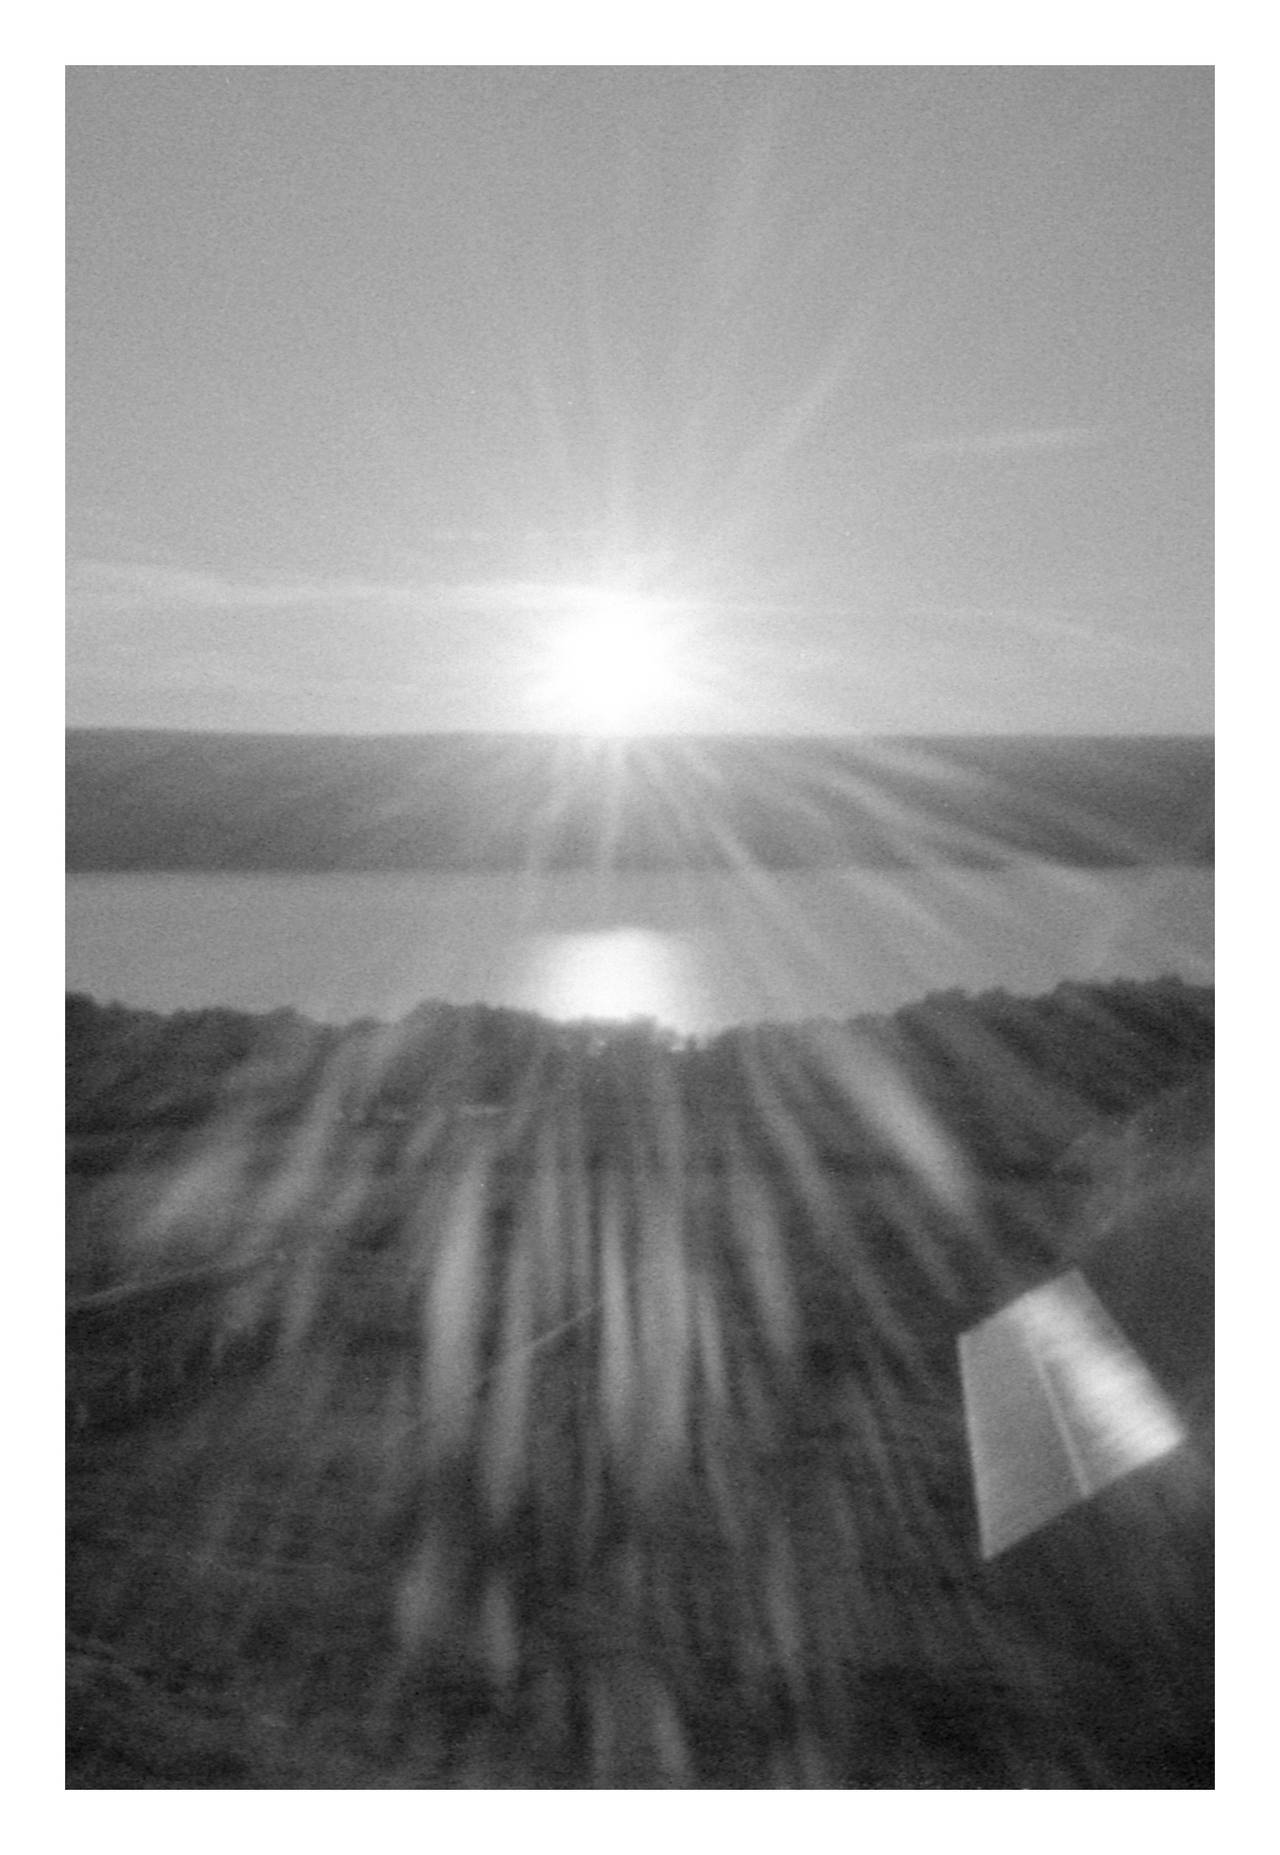 2018-302 Seneca Lake Sunset by pearwood